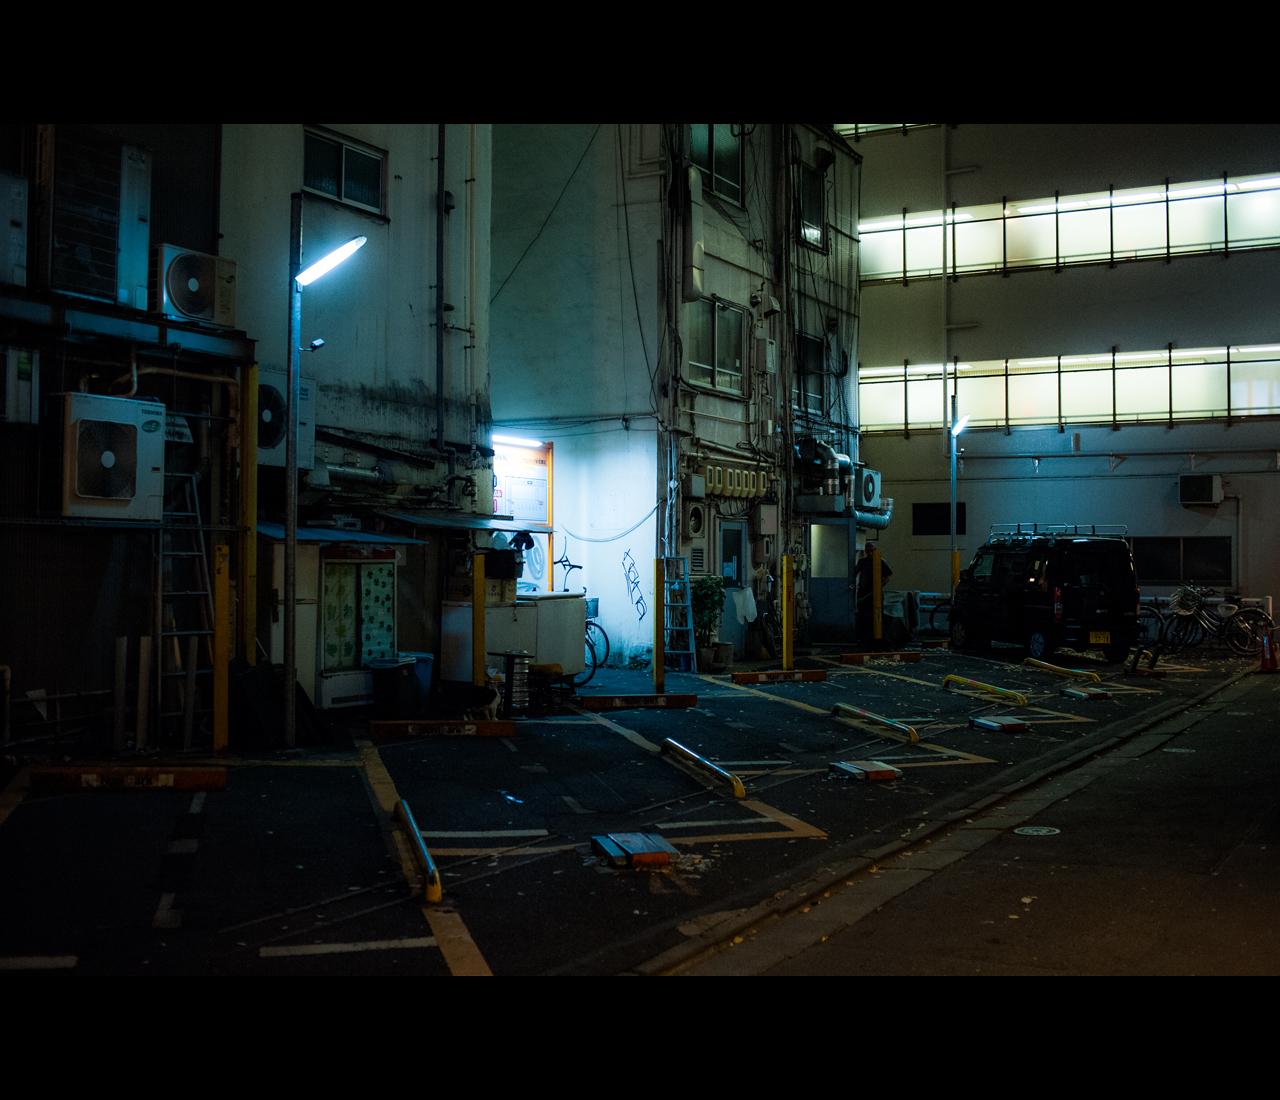 Back Alley by burningmonk